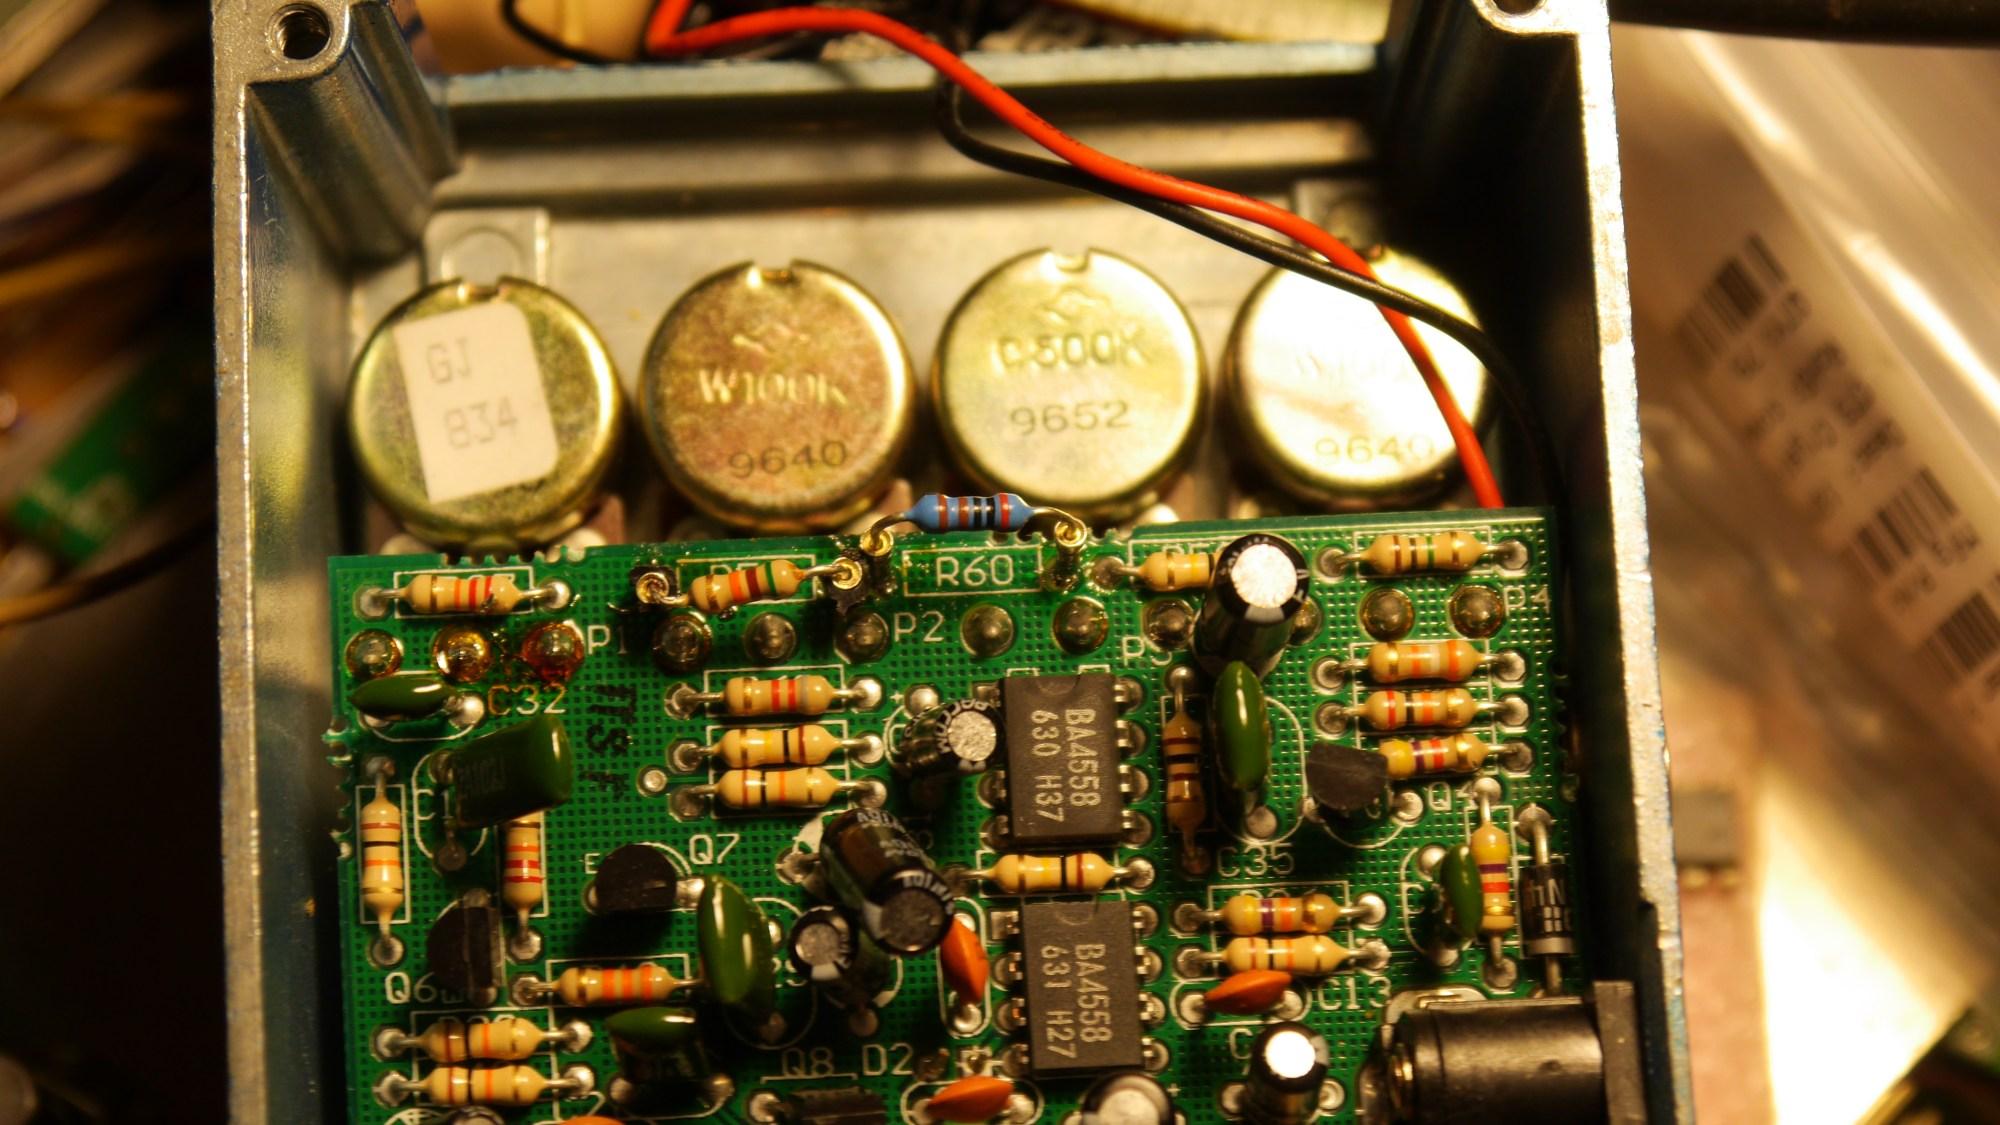 hight resolution of dod wiring diagram yjm wiring diagram wiring diagram and schematic dod wiring diagram